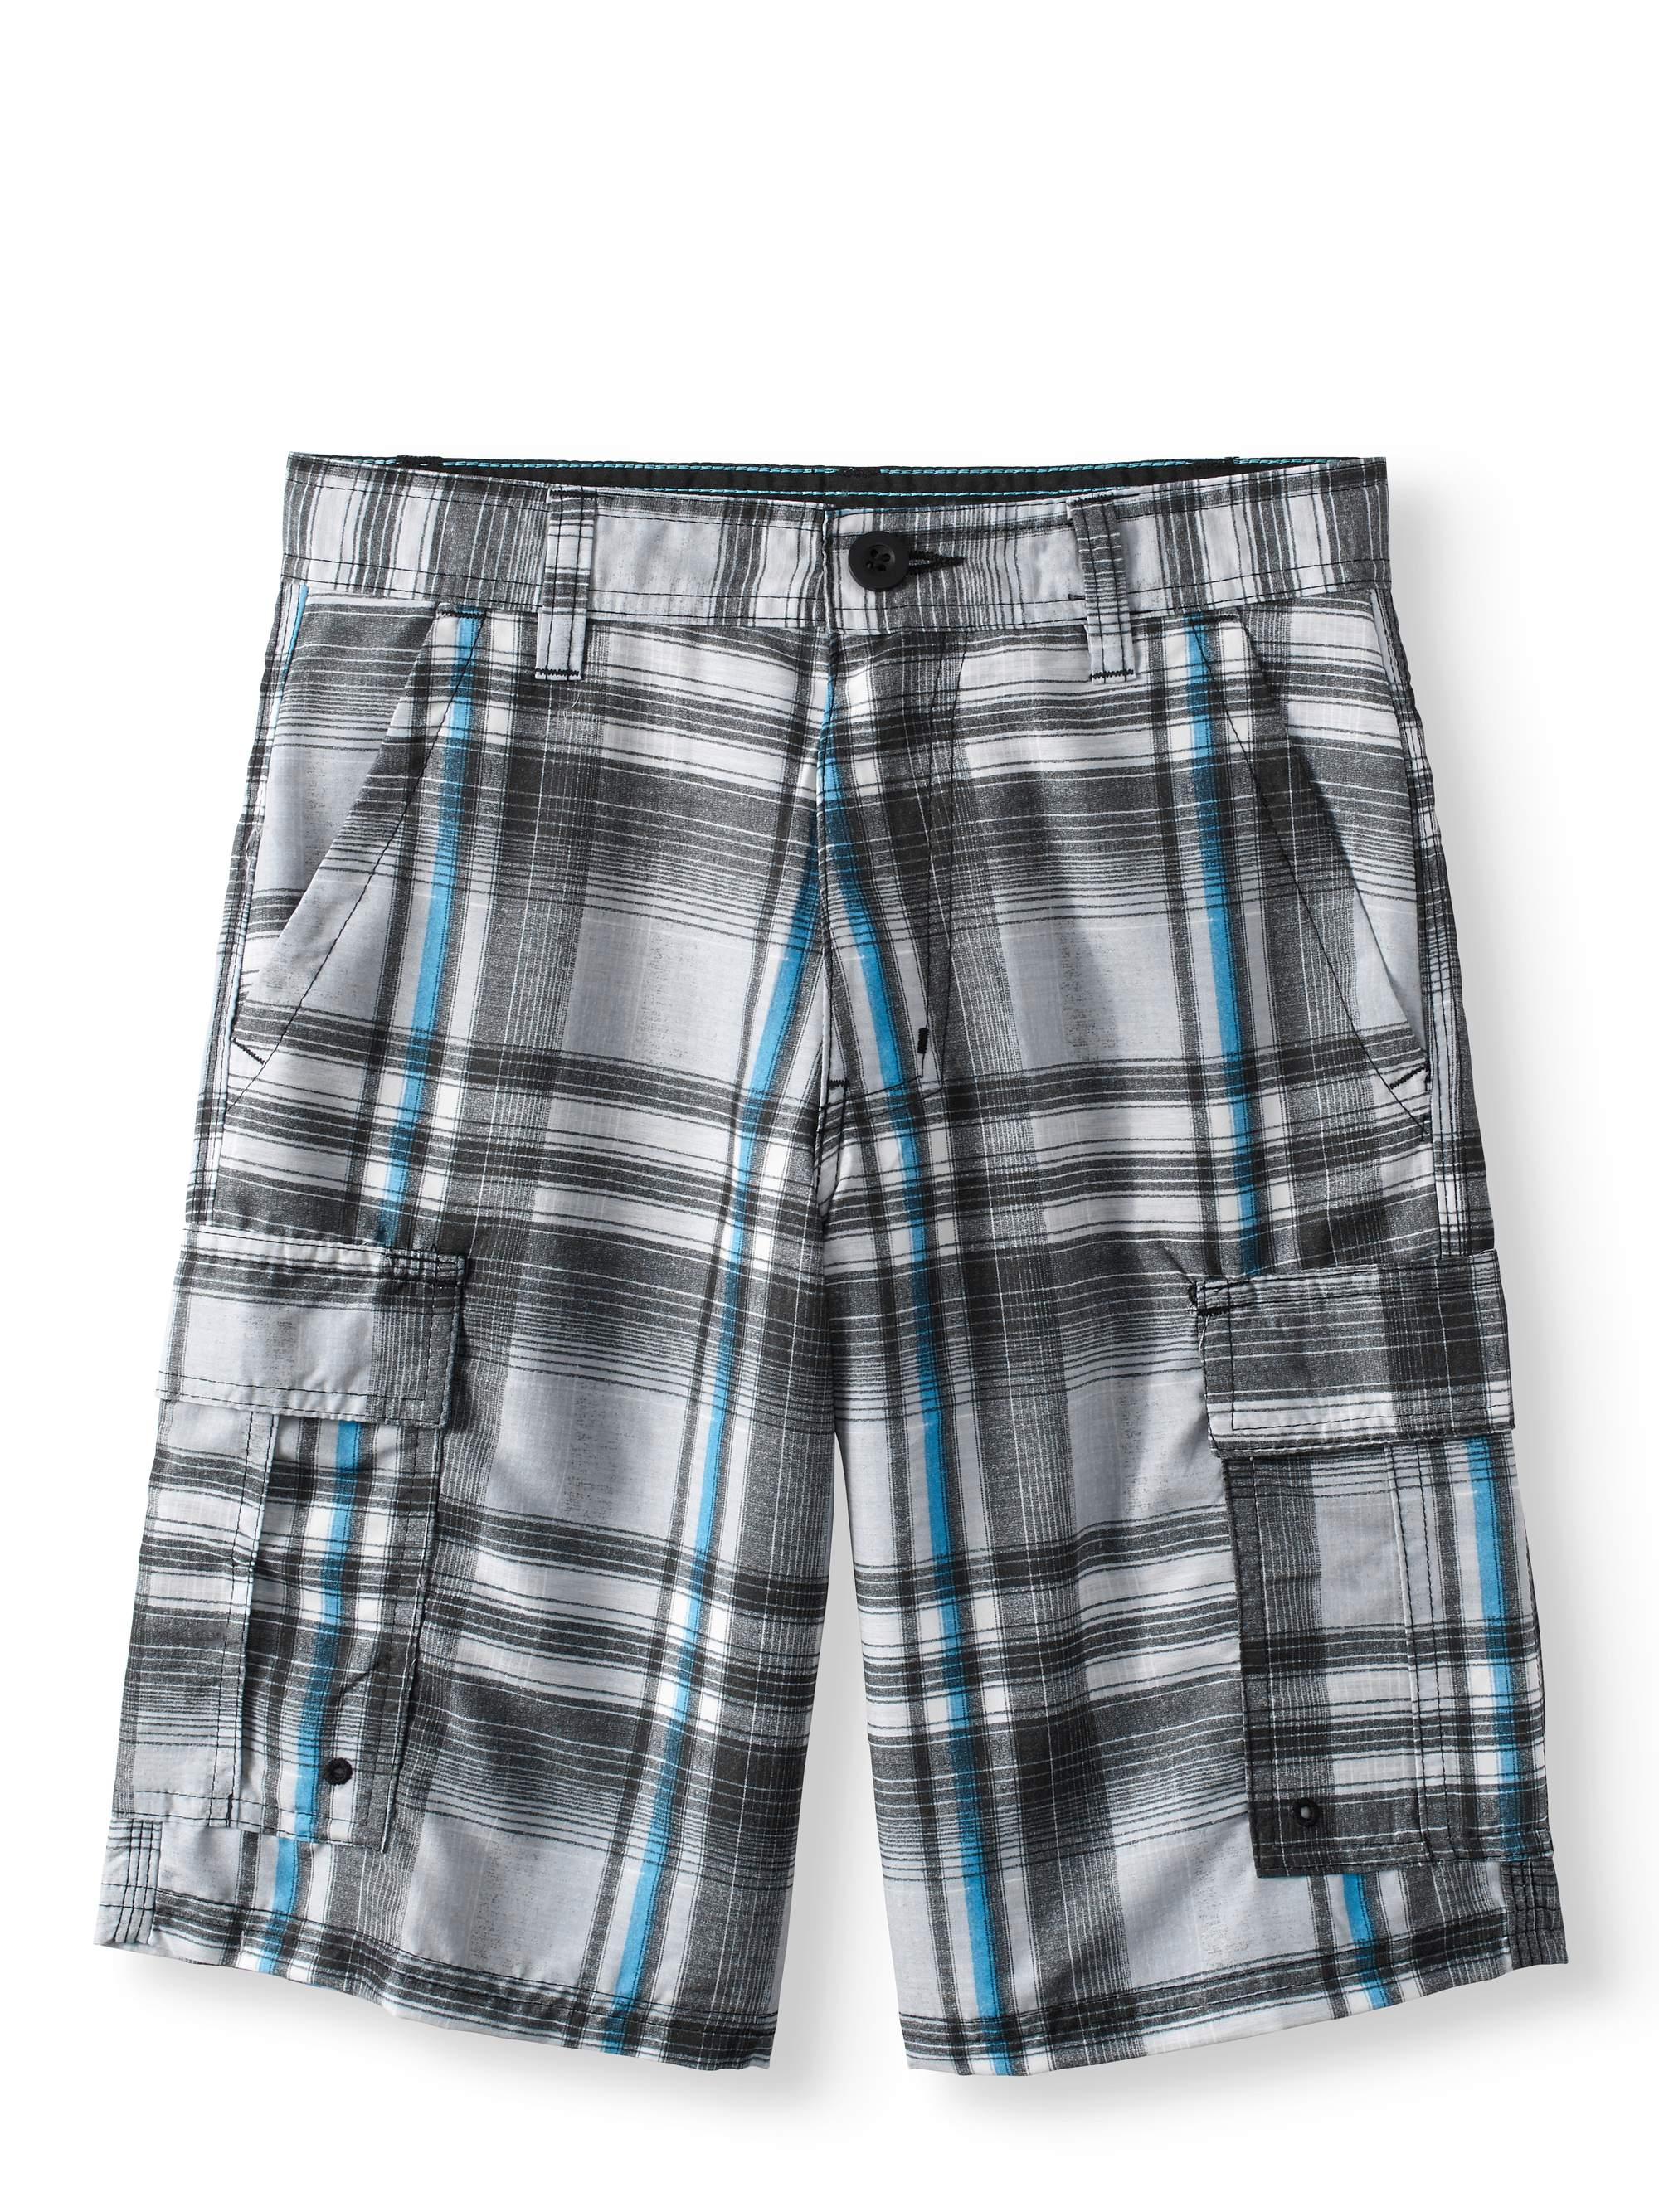 Big Boys Plaid Cargo Shorts $8.99 2-day shipping@walmart